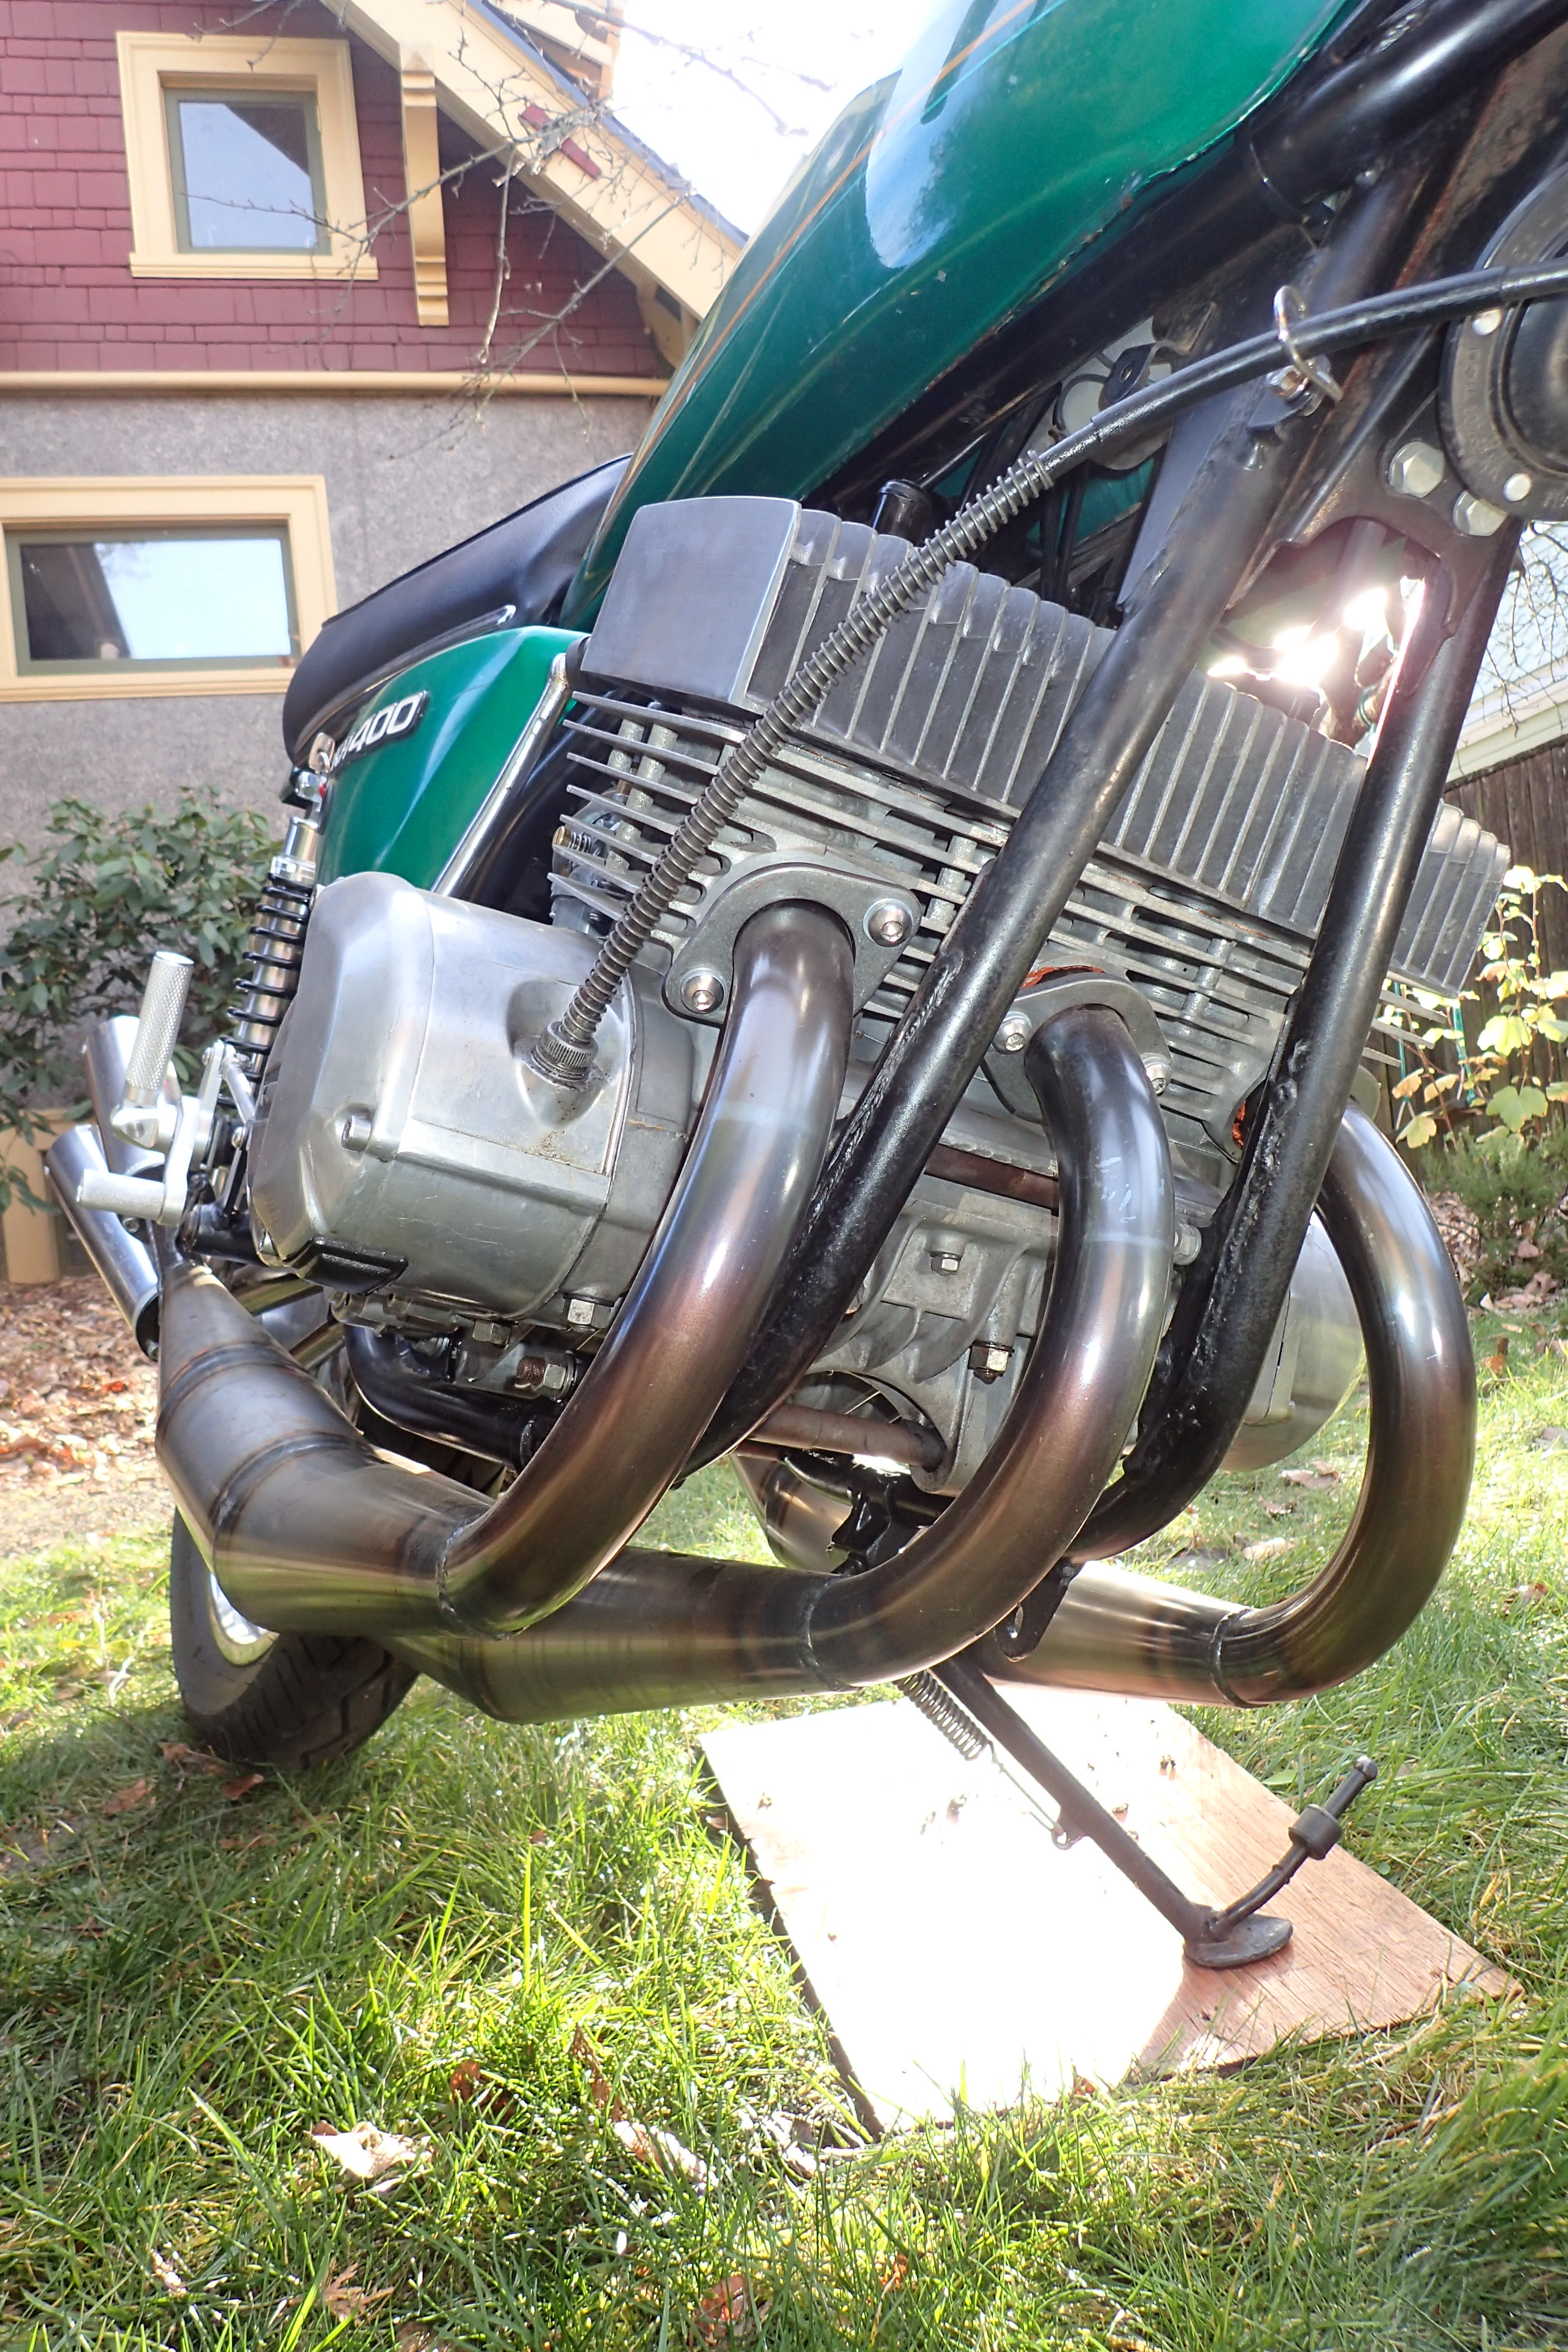 craigslist portland oregon motorcycles   Amatmotor.co